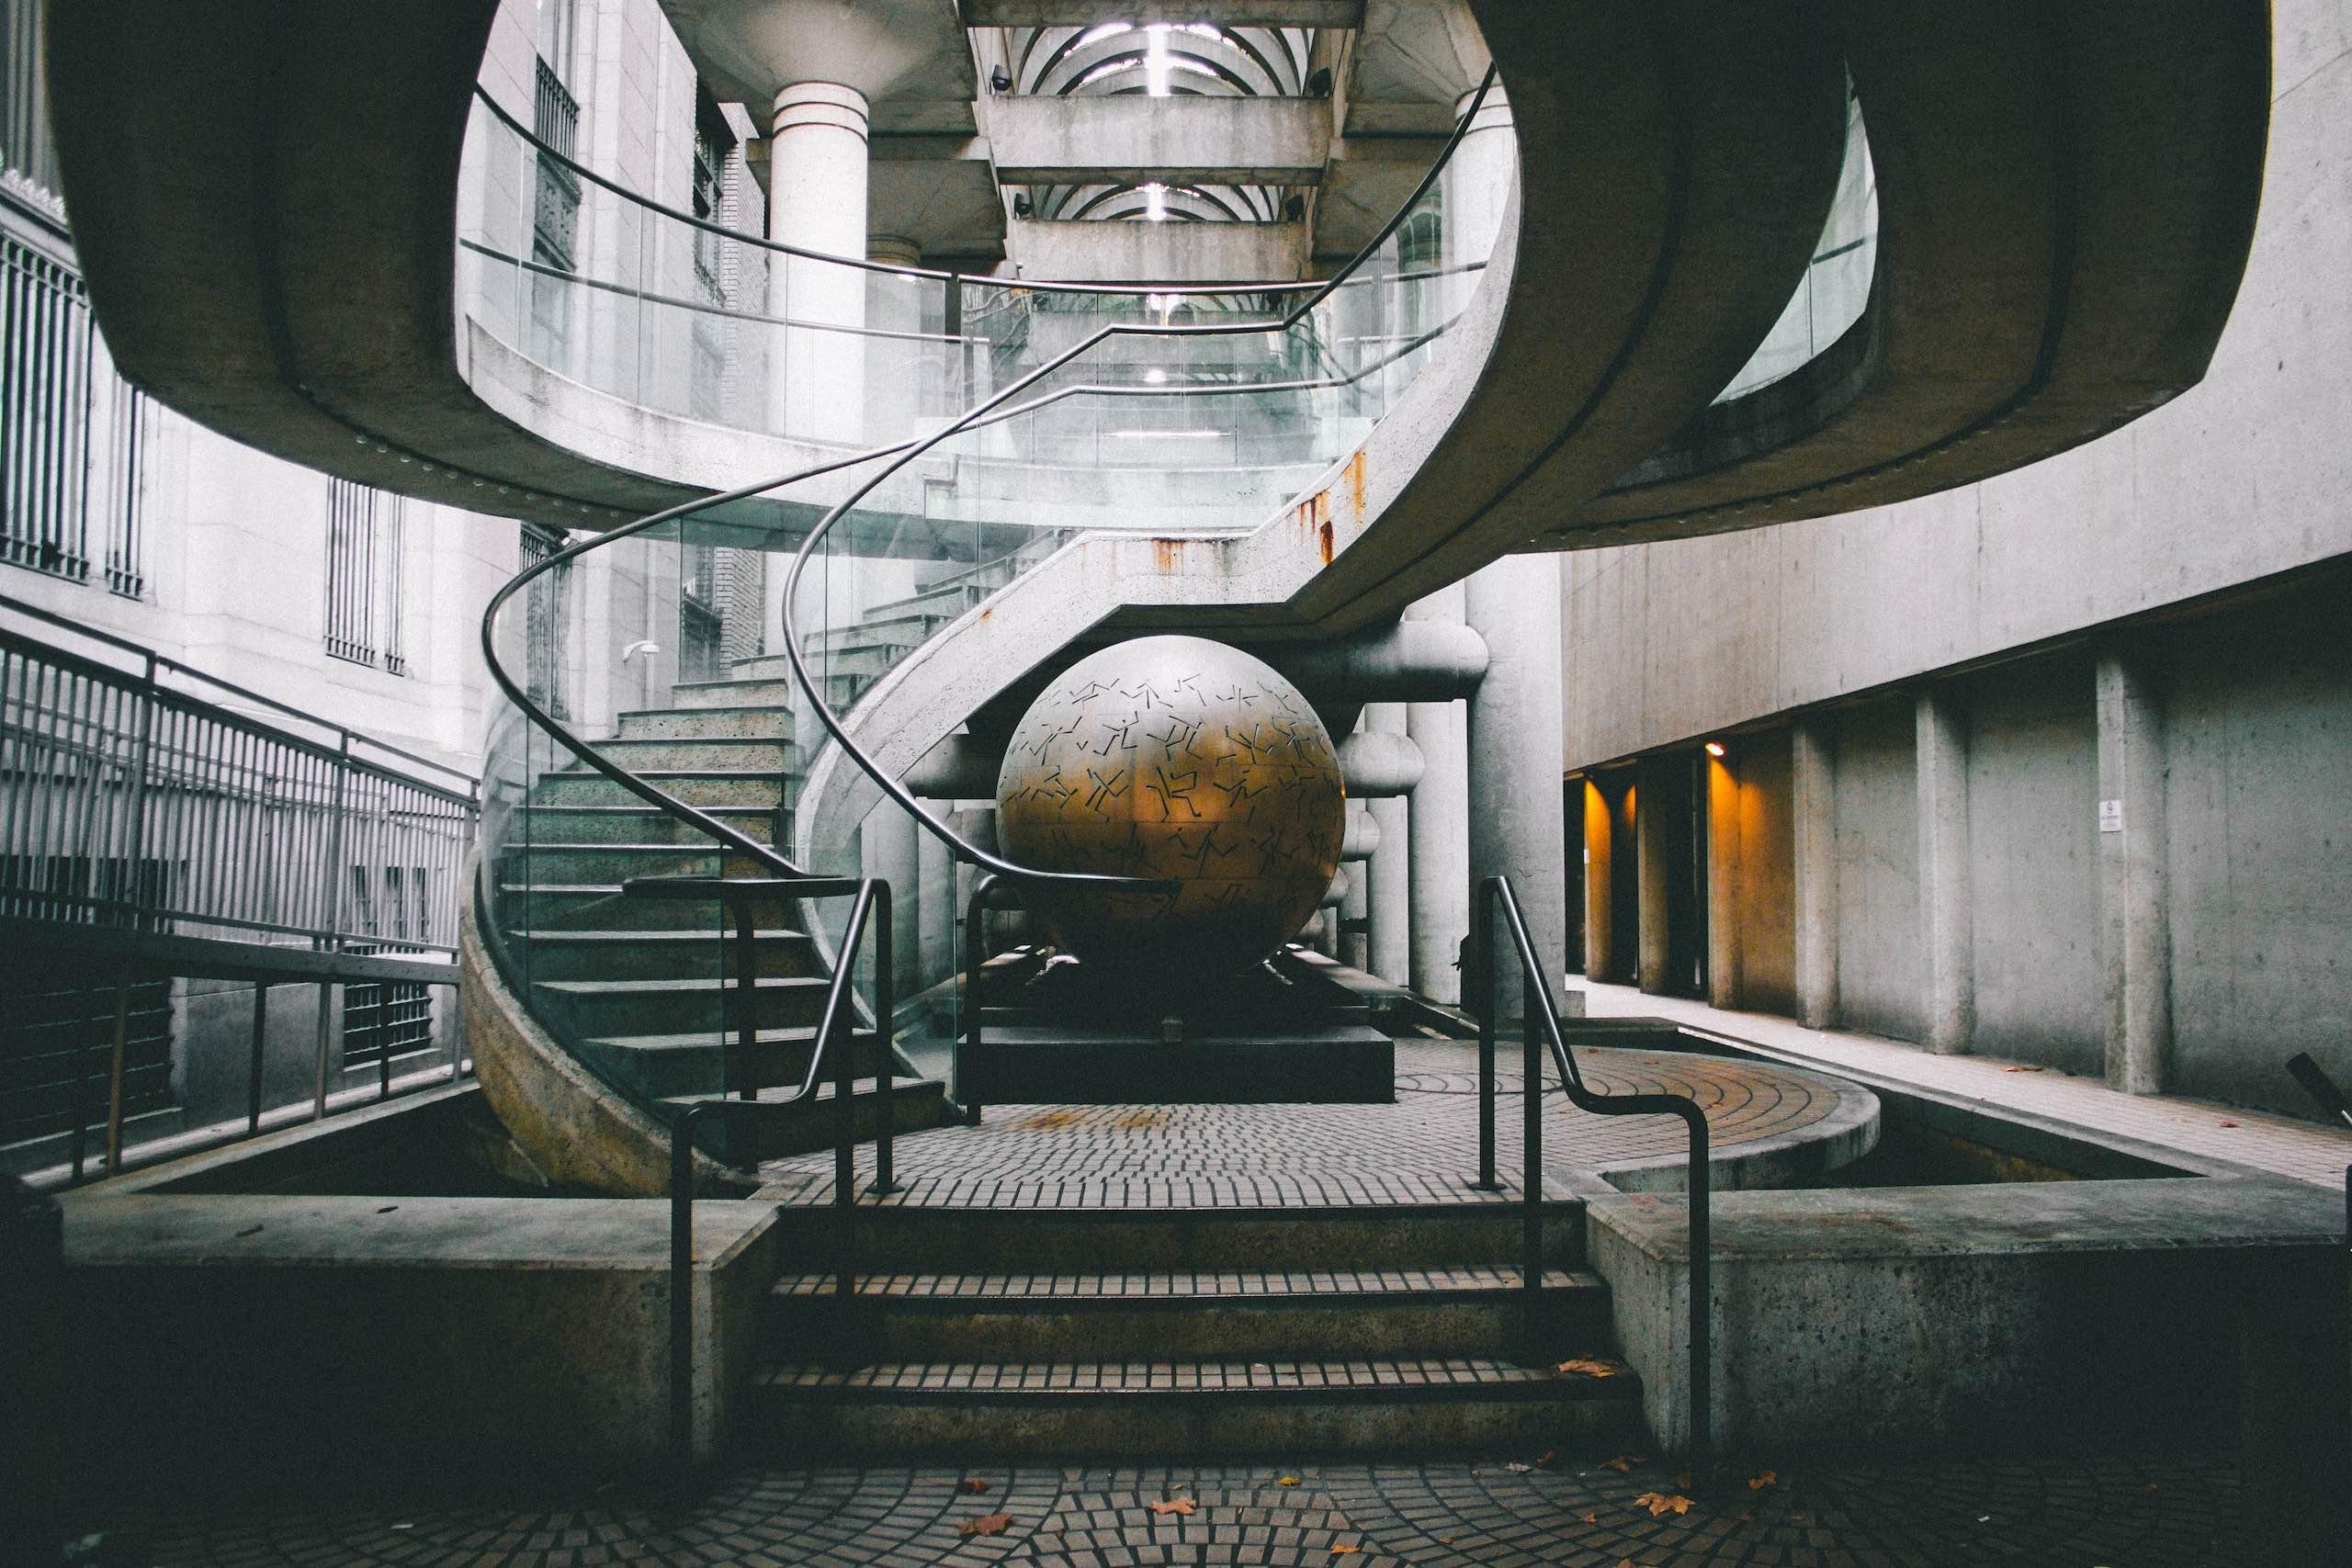 Embarcadero Center |Photo: Nick Jio